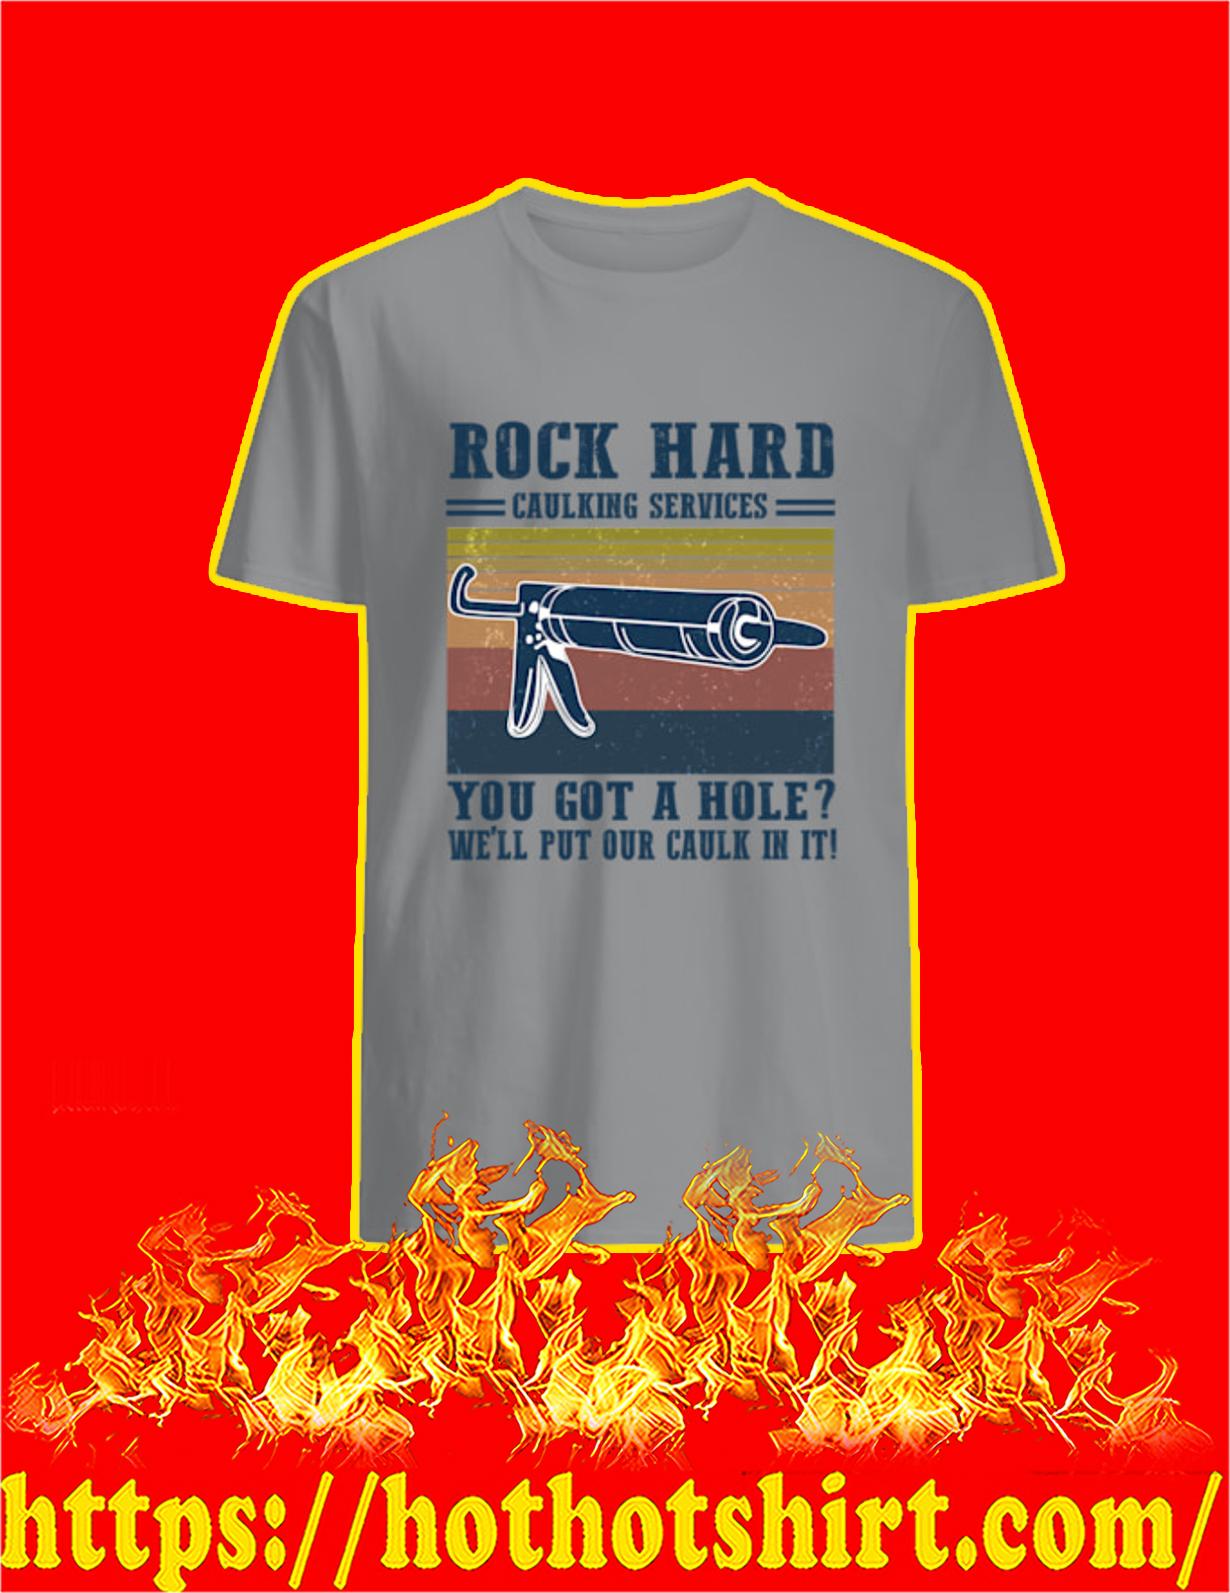 Rock hard caulking services you got a hole shirt